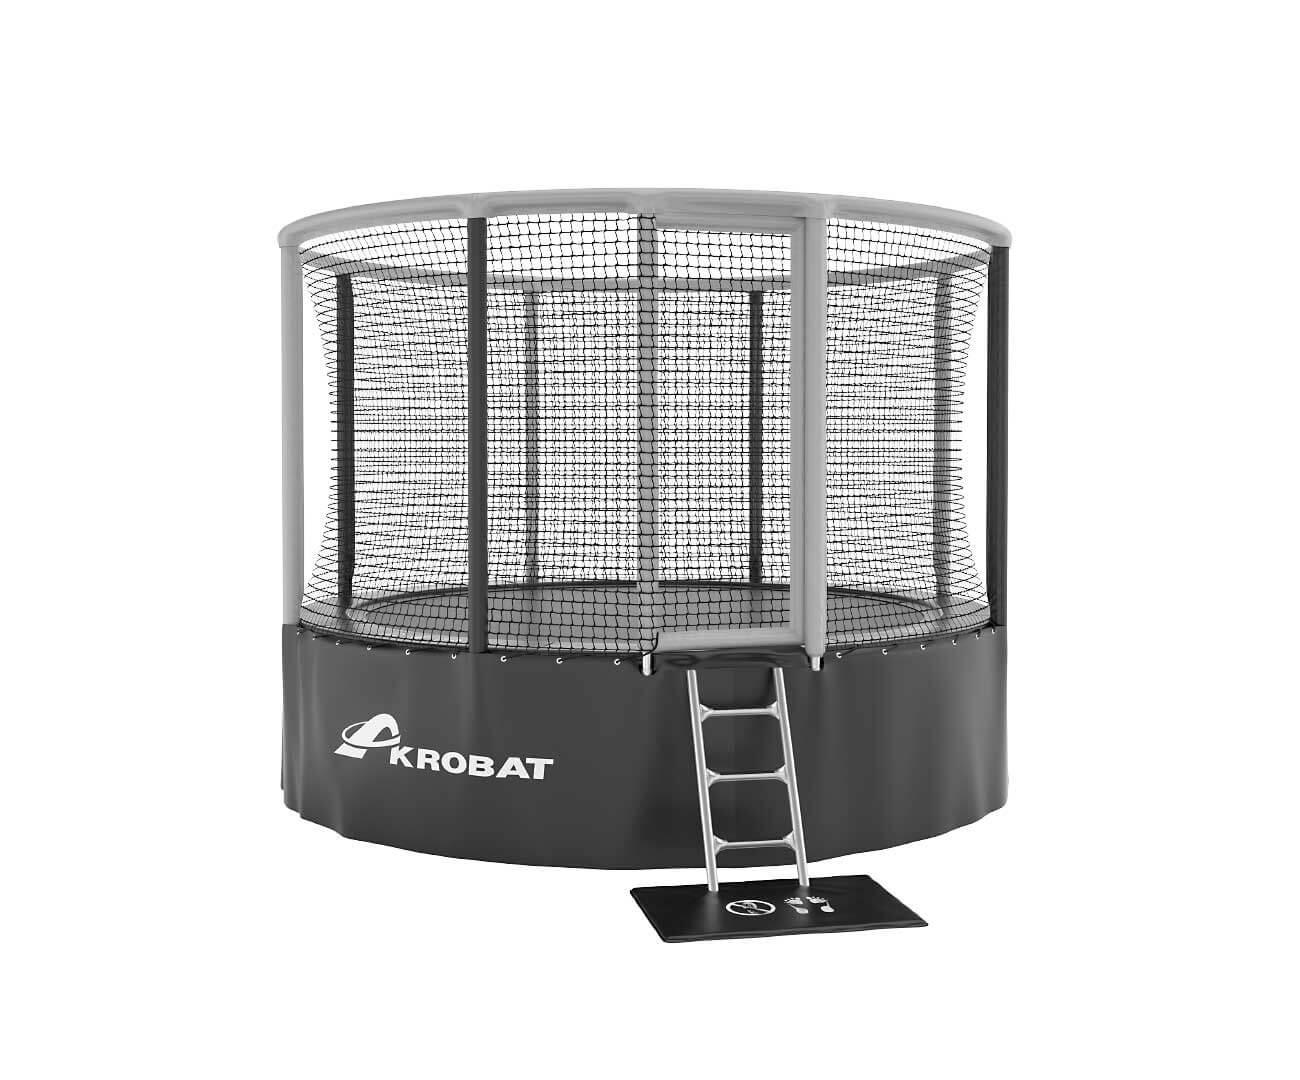 Akrobat Gallus 12 Grey-black enclosure /Black safety pad/ Grey jumping mat